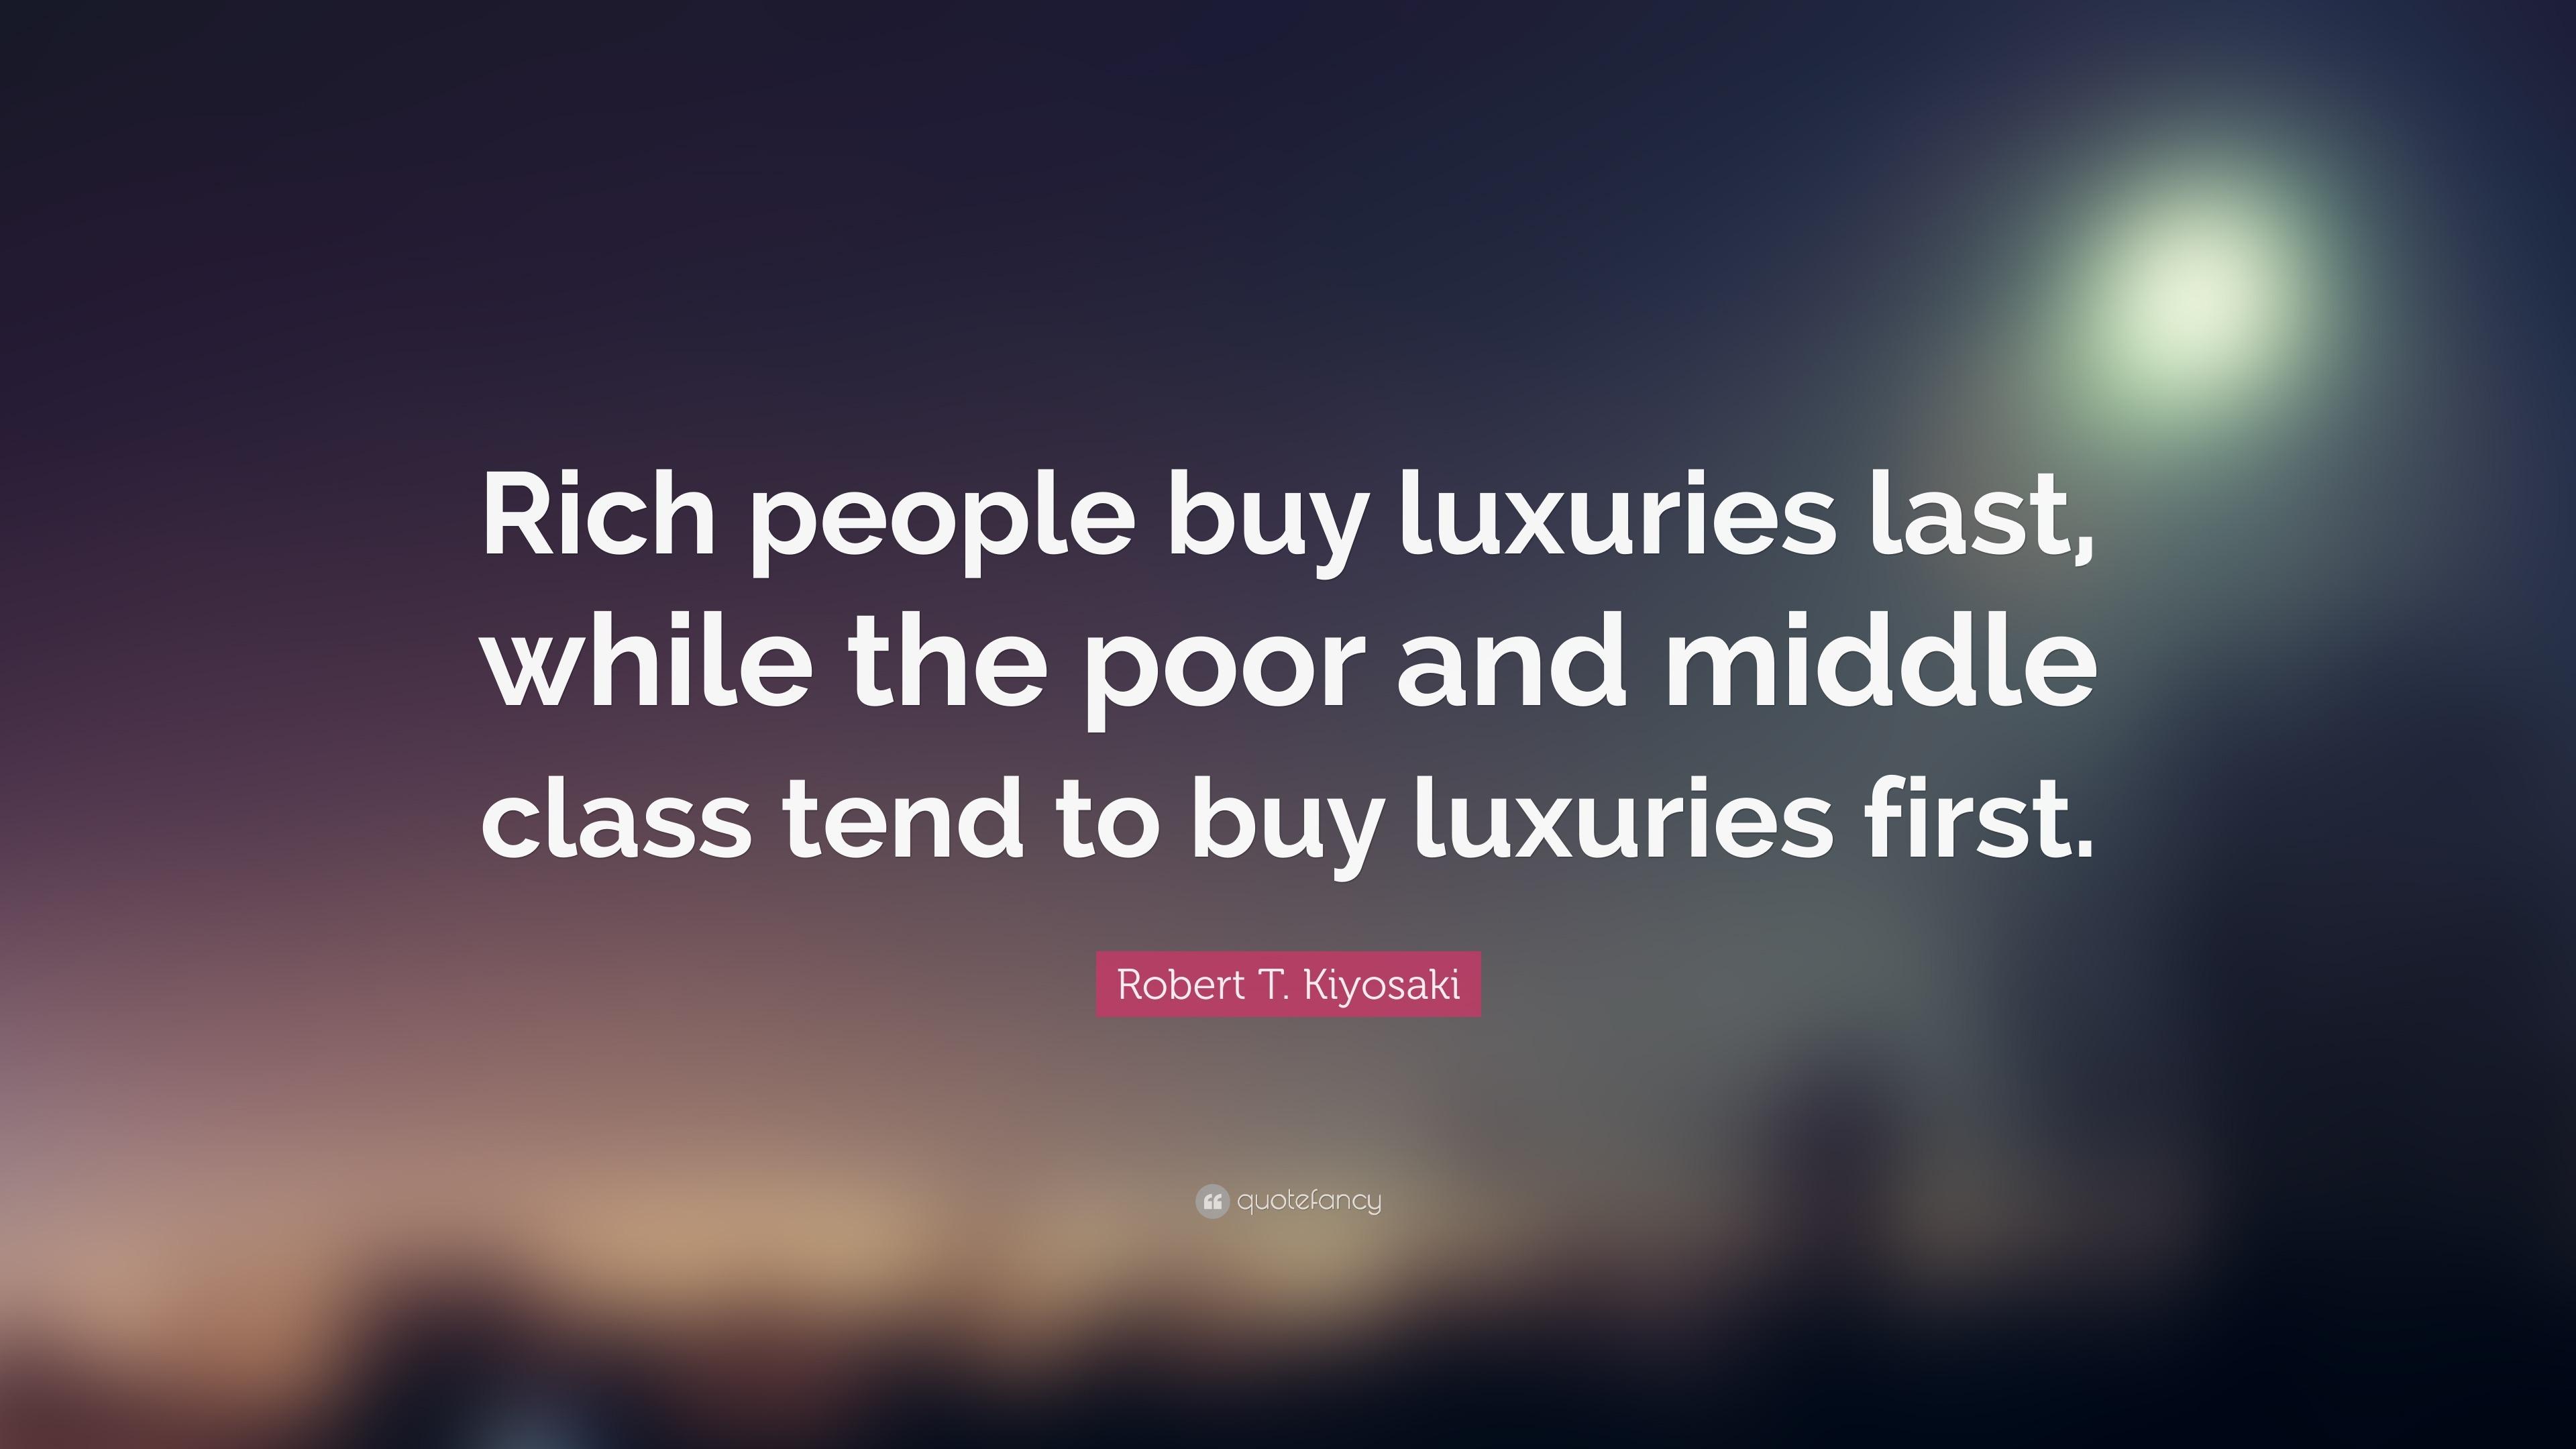 Robert T Kiyosaki Quote Rich People Buy Luxuries Last While The